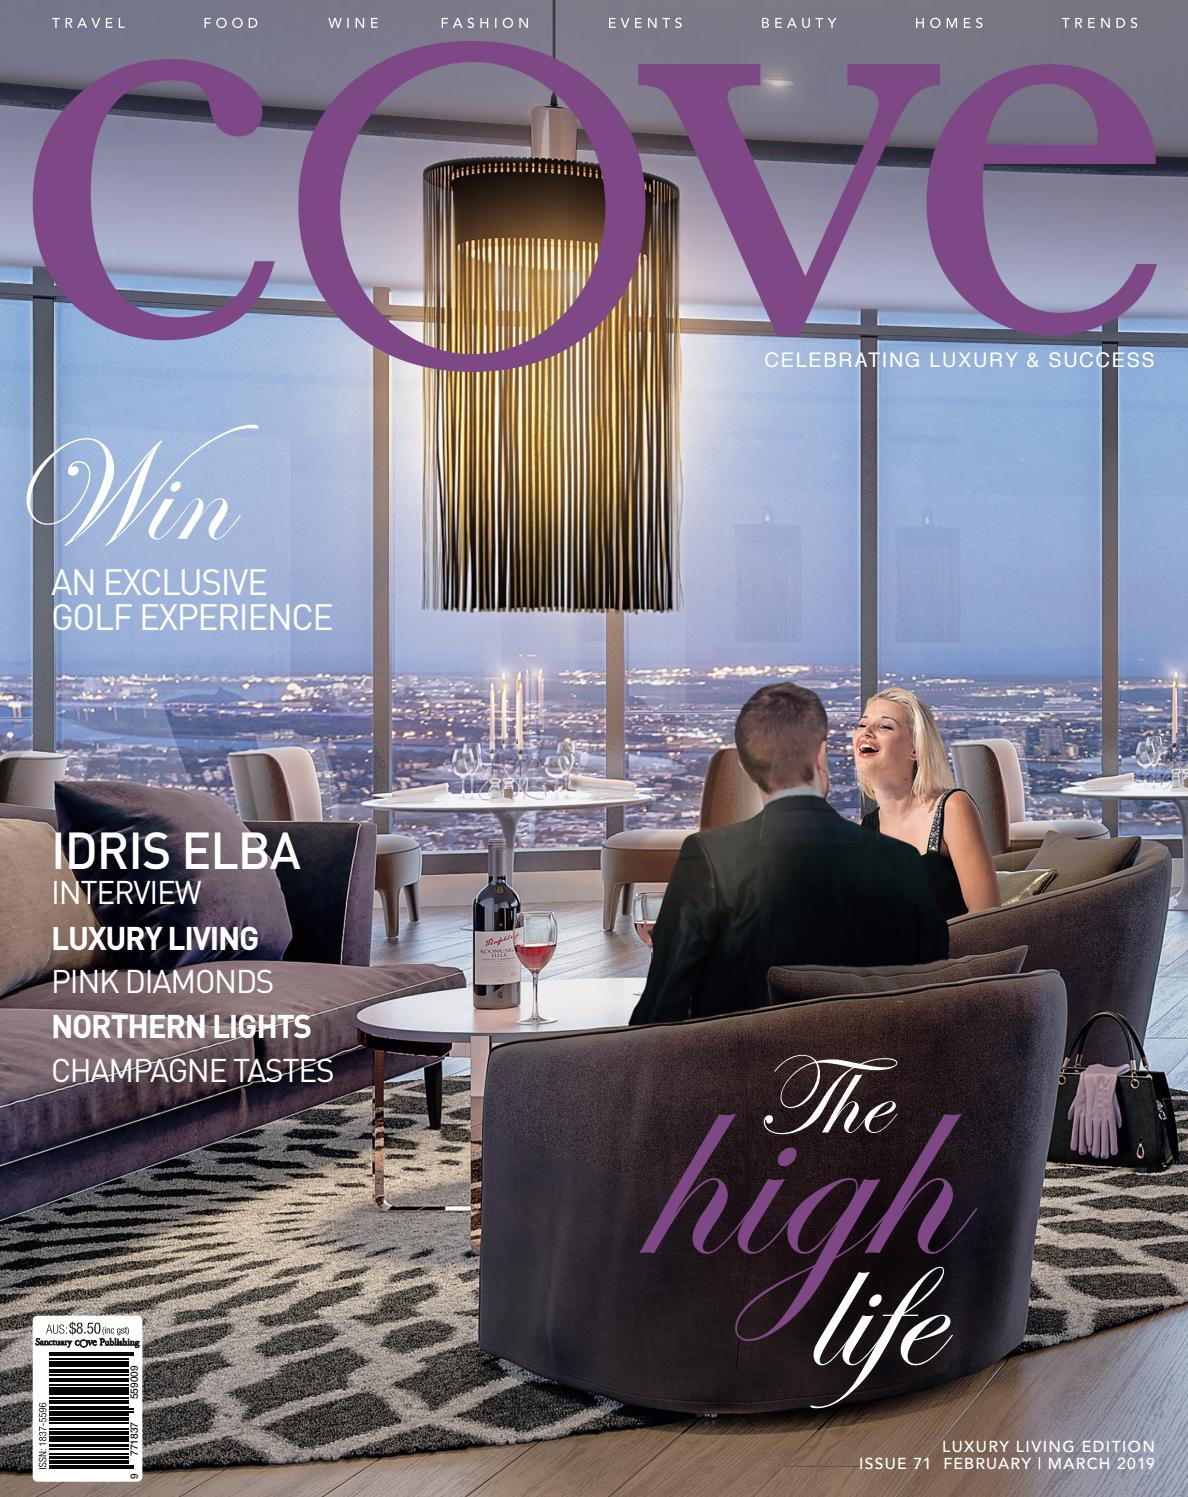 7b24d5391e The Cove Magazine by The Cove Magazine - issuu